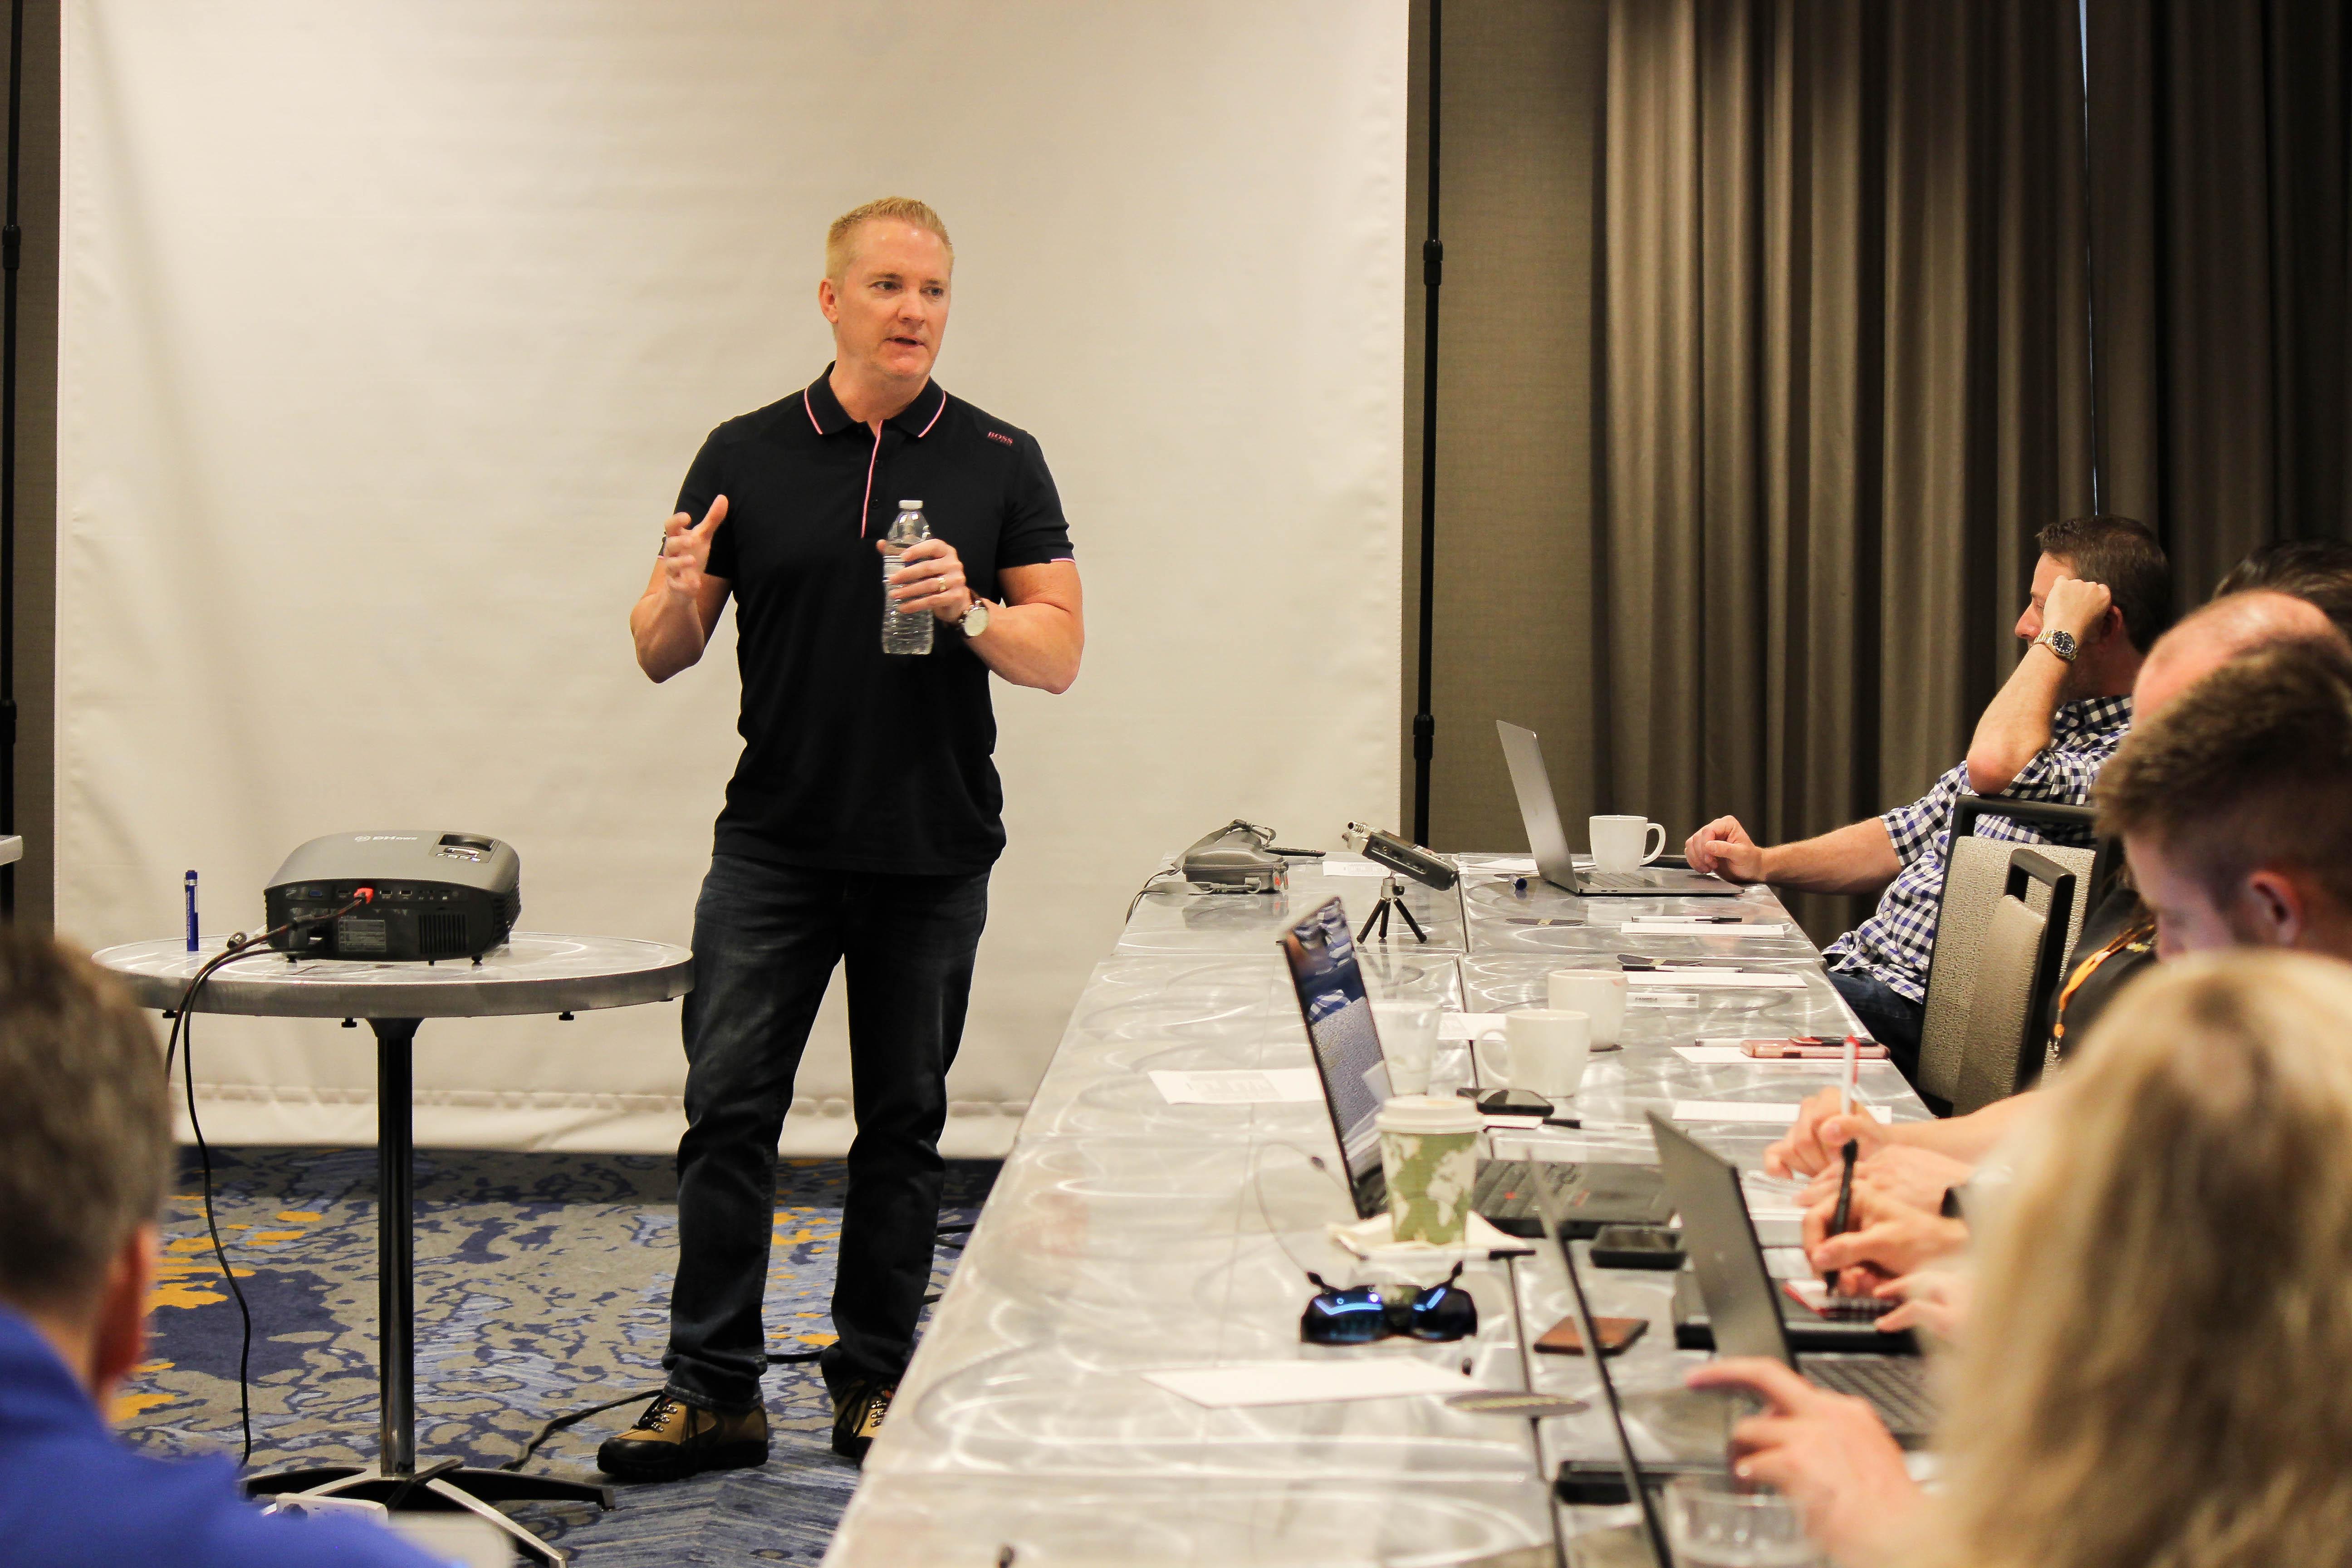 Mike-Van-Norden-at-WeBuyHouses.com-Mastermind-Conference